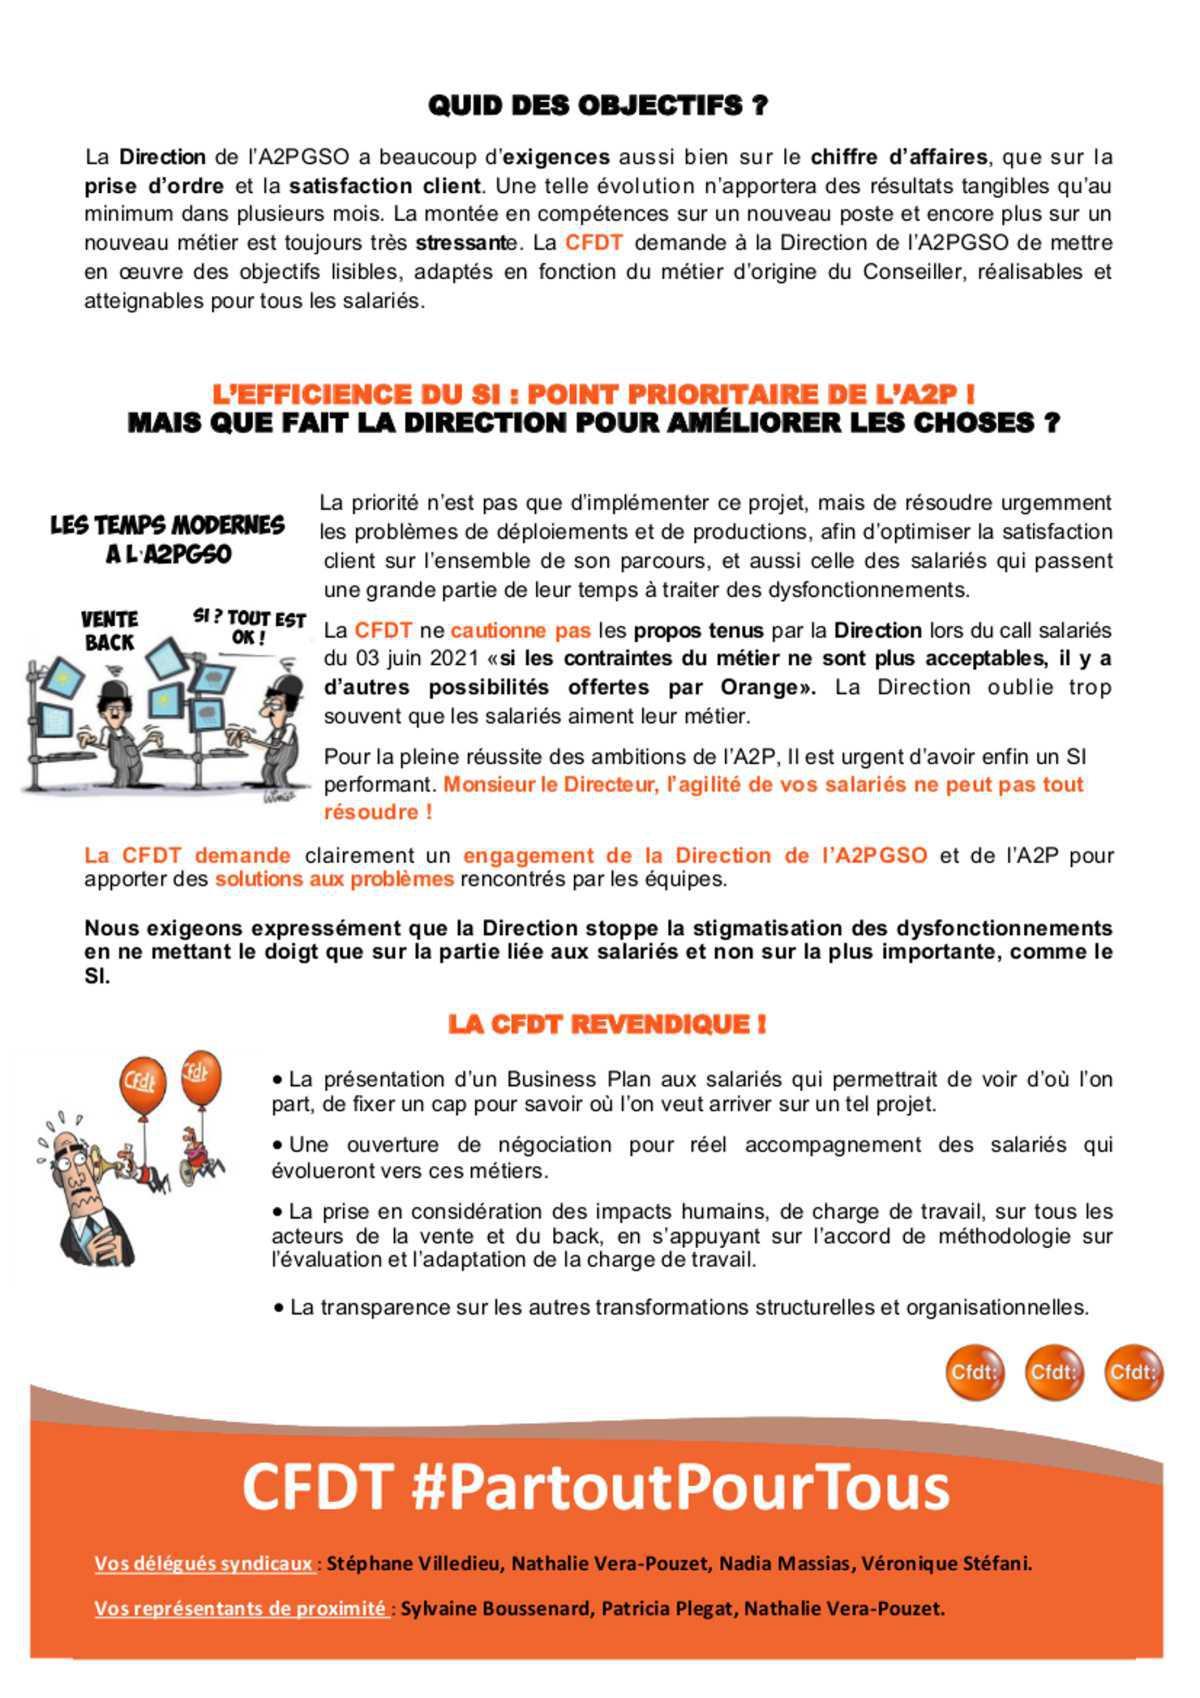 AGPRO-PME GSO - Nouveau modele de vente - Juin 2021